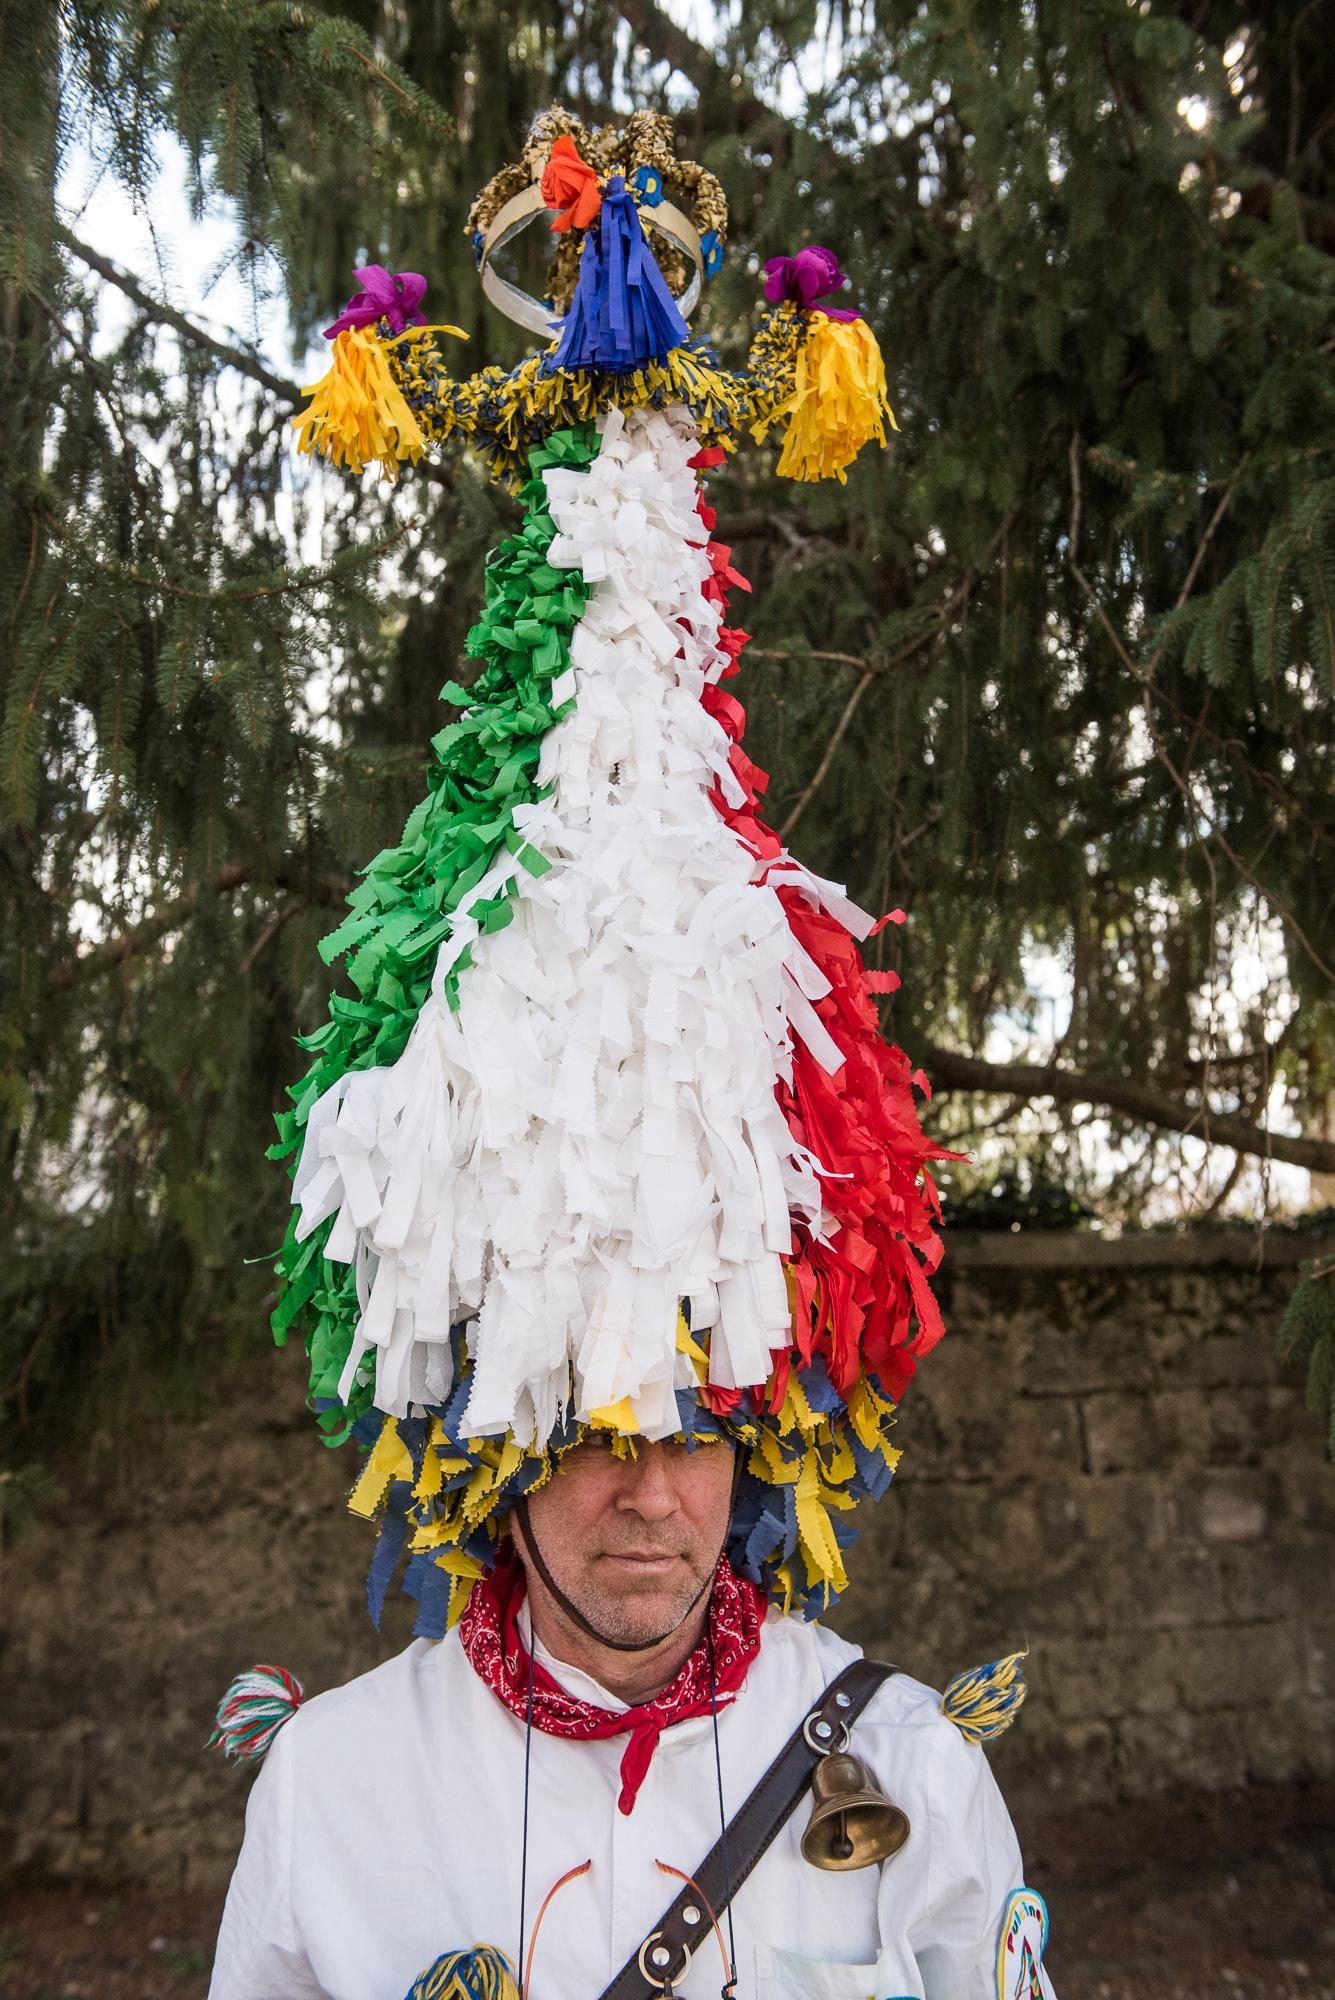 03_2019_Italy_SanPietroNatisone_Pust_Portraits_0082.jpg